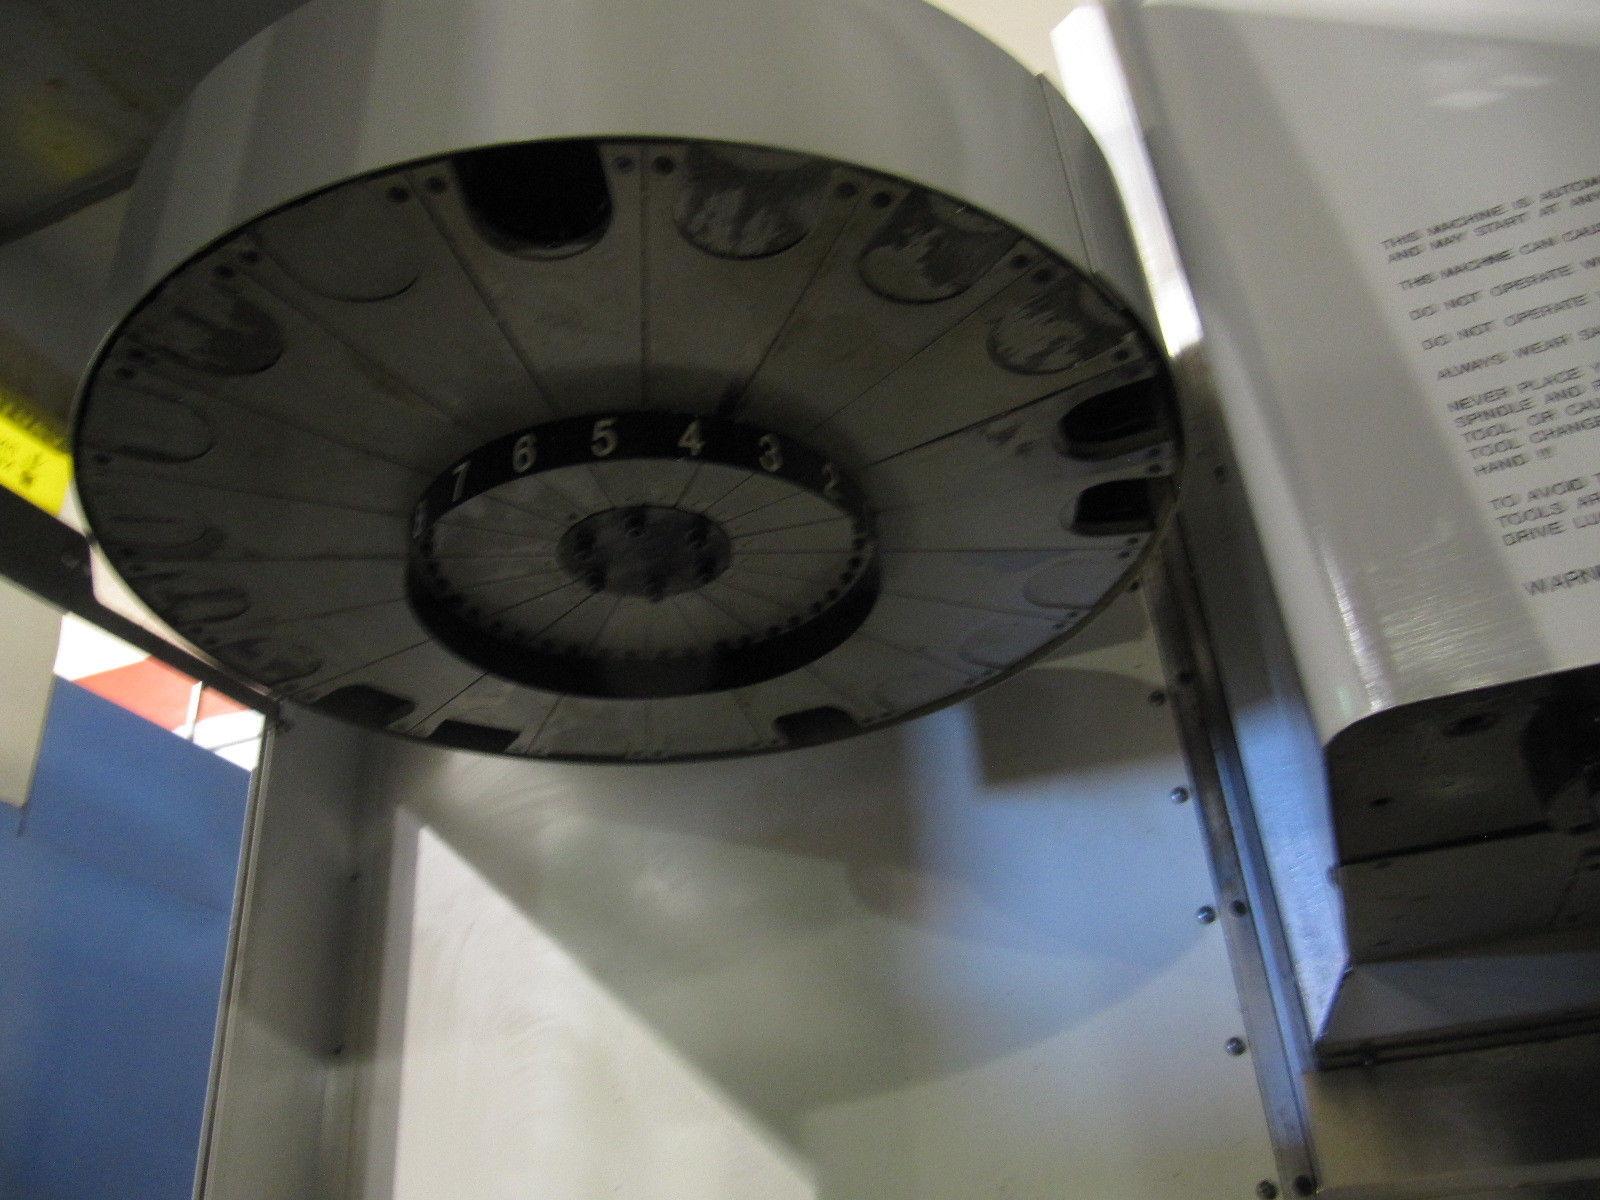 HAAS VF-0 CNC Vertical Mill - MachineStation Haas Wye Delta Wiring Diagram on wye delta connection, wye delta voltage, wye delta starting, wye start delta run diagram, wye delta panels, wye delta starter, wye delta motor, wye delta transformers,